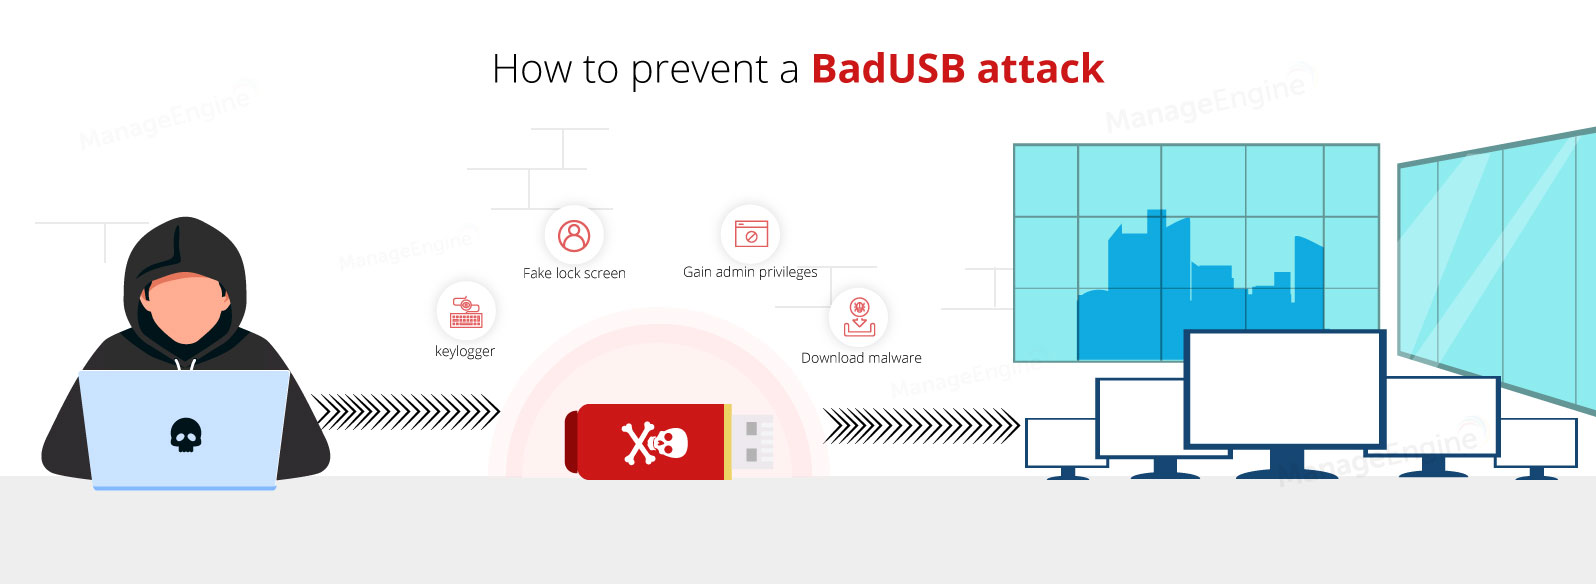 BadUSB exploit prevention - ManageEngine Device Control Plus